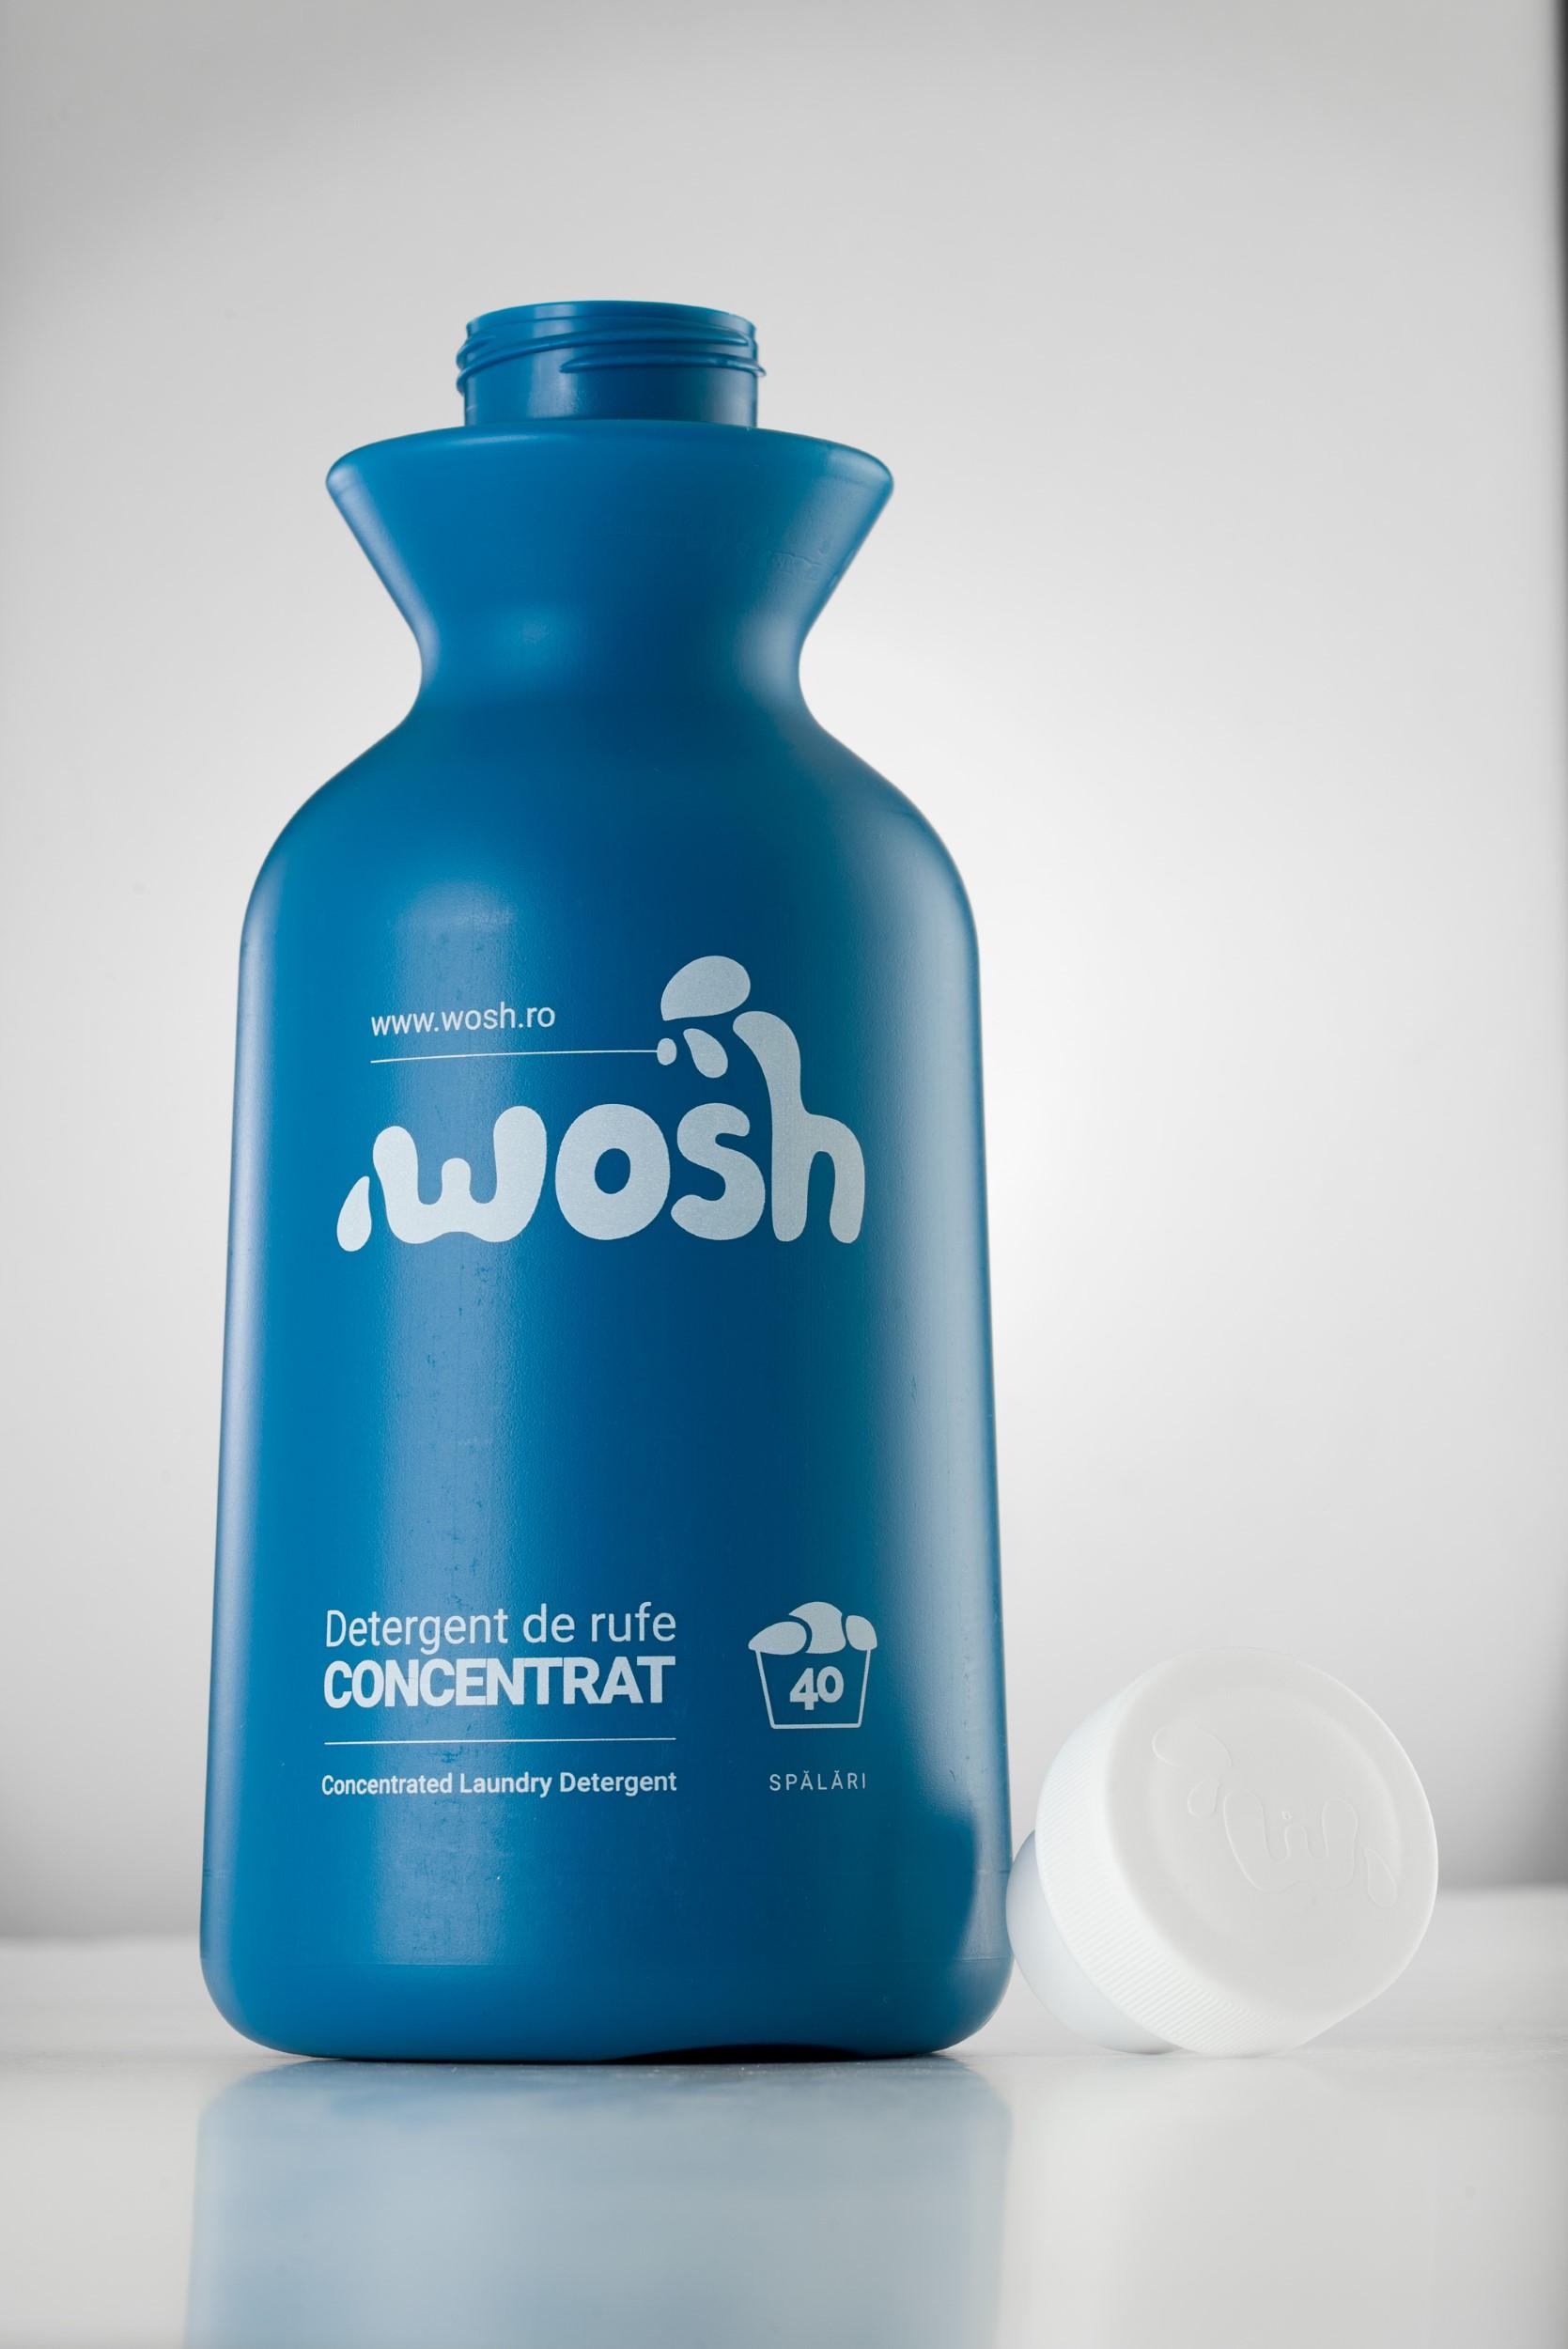 Wosh laundry detergent bfa2